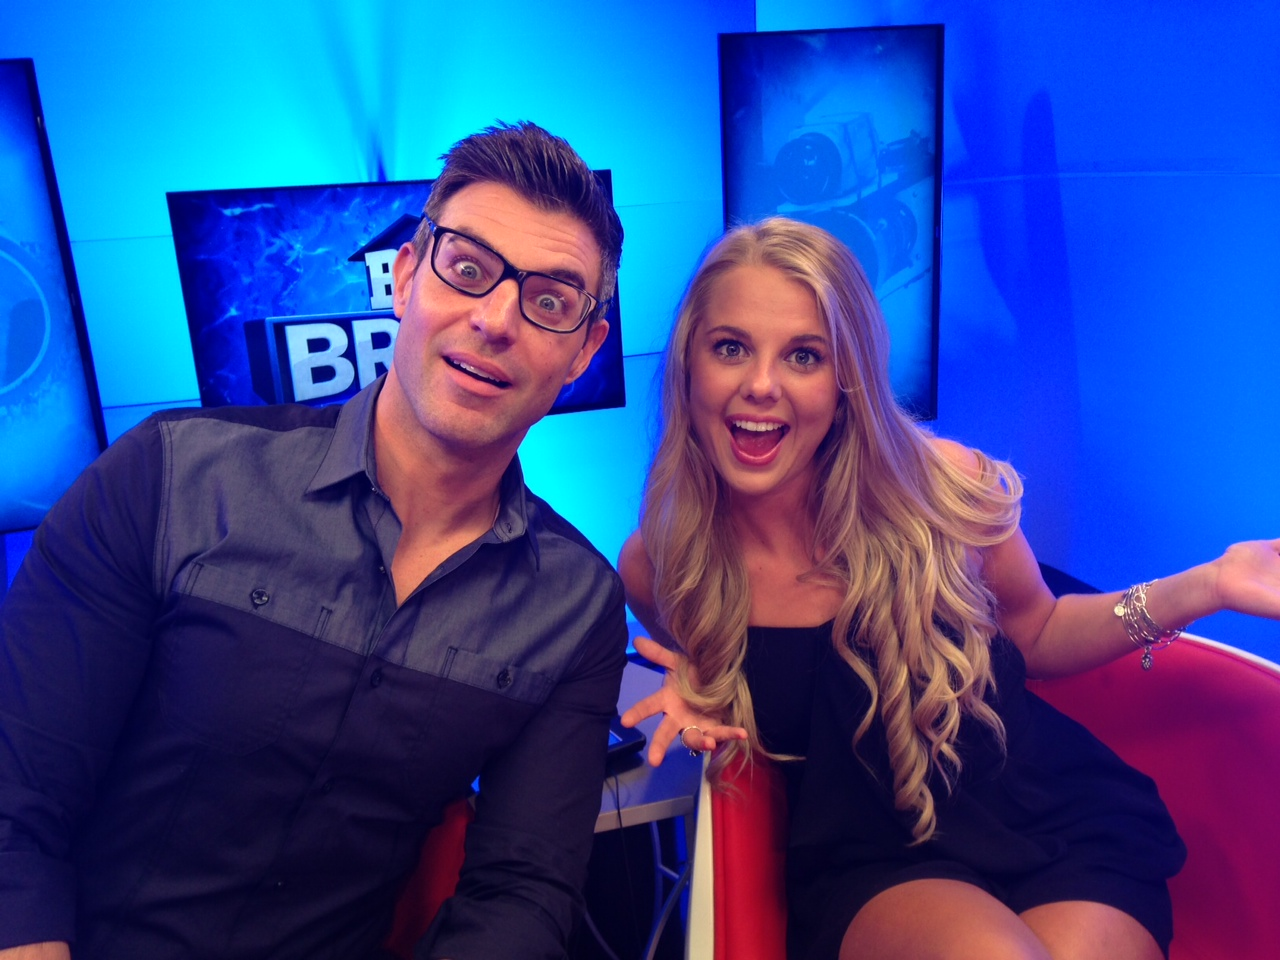 Jeff tries on Nicole's glasses